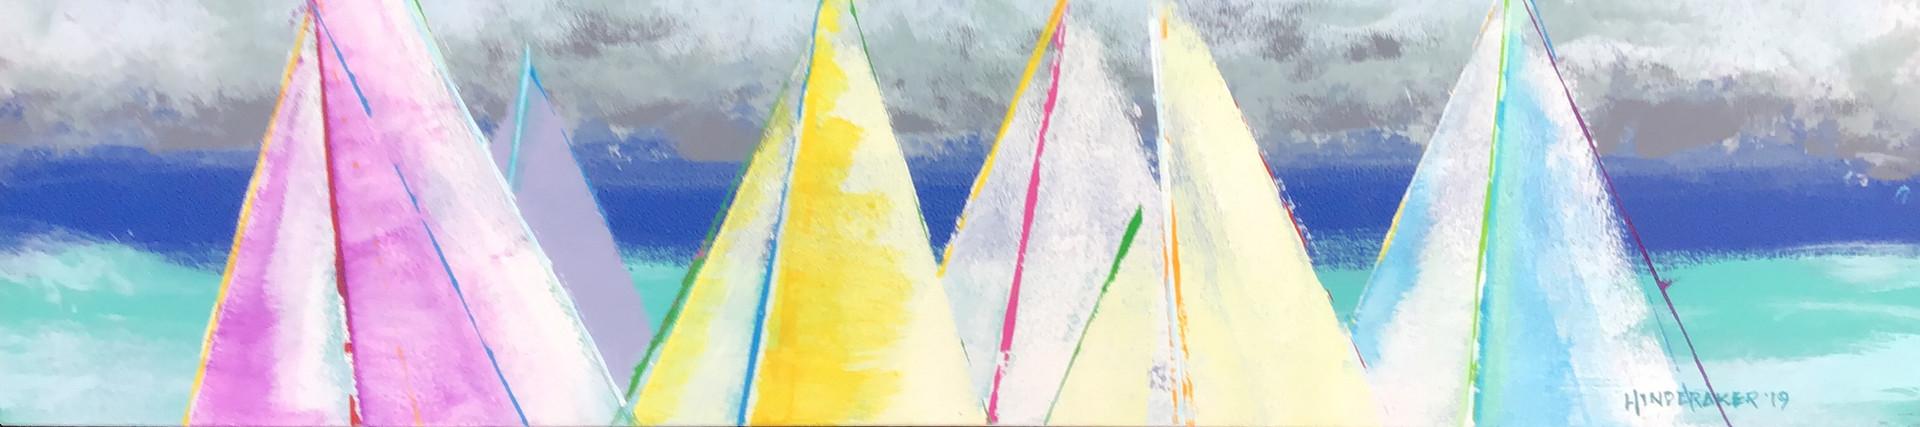 Sails #191